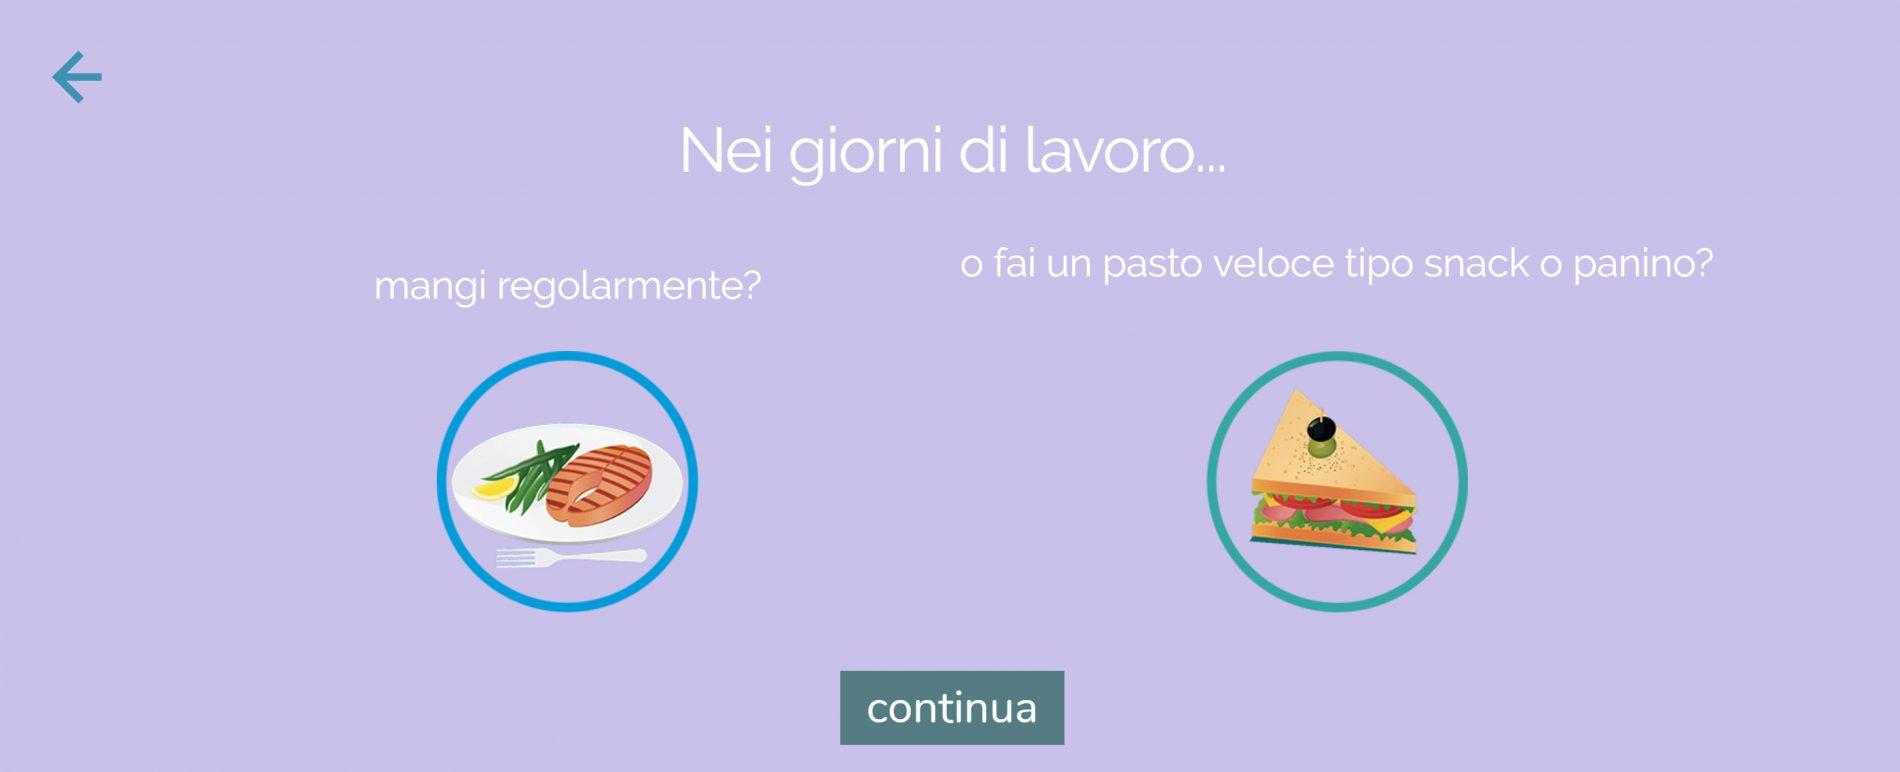 dieta melarossa iscrizione: scelta dieta panino